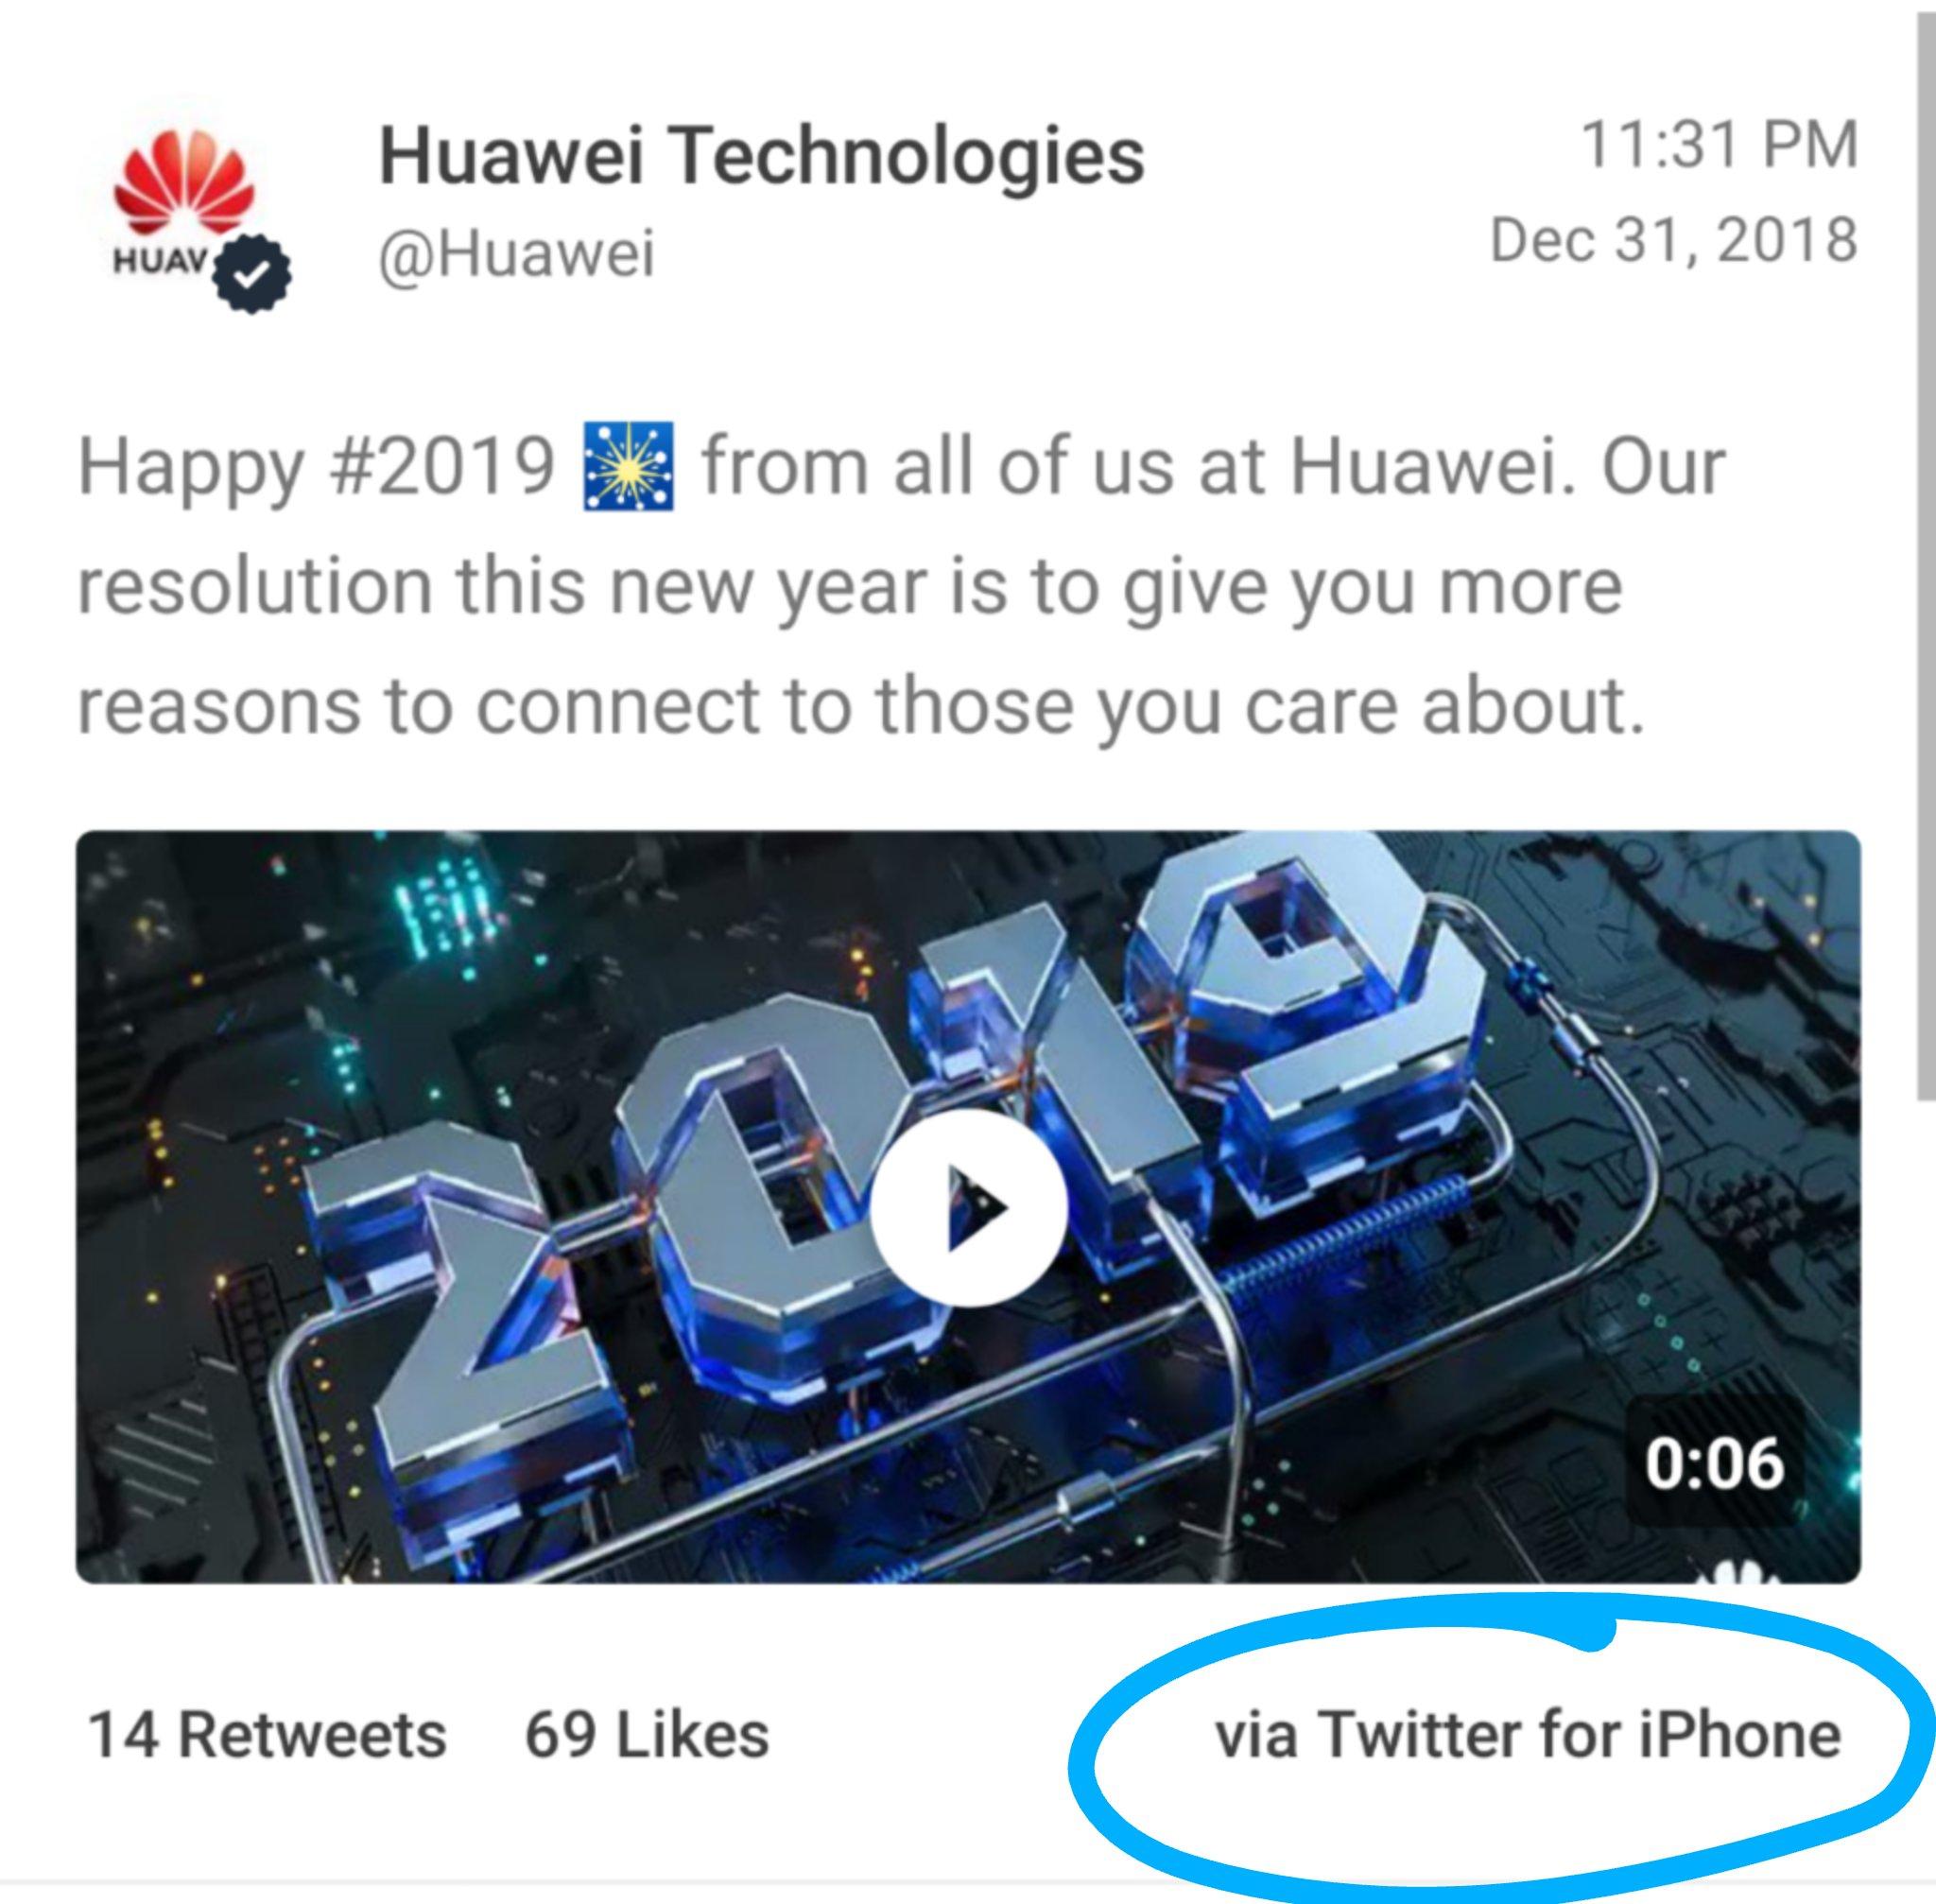 Tweet da Huawei via iPhone